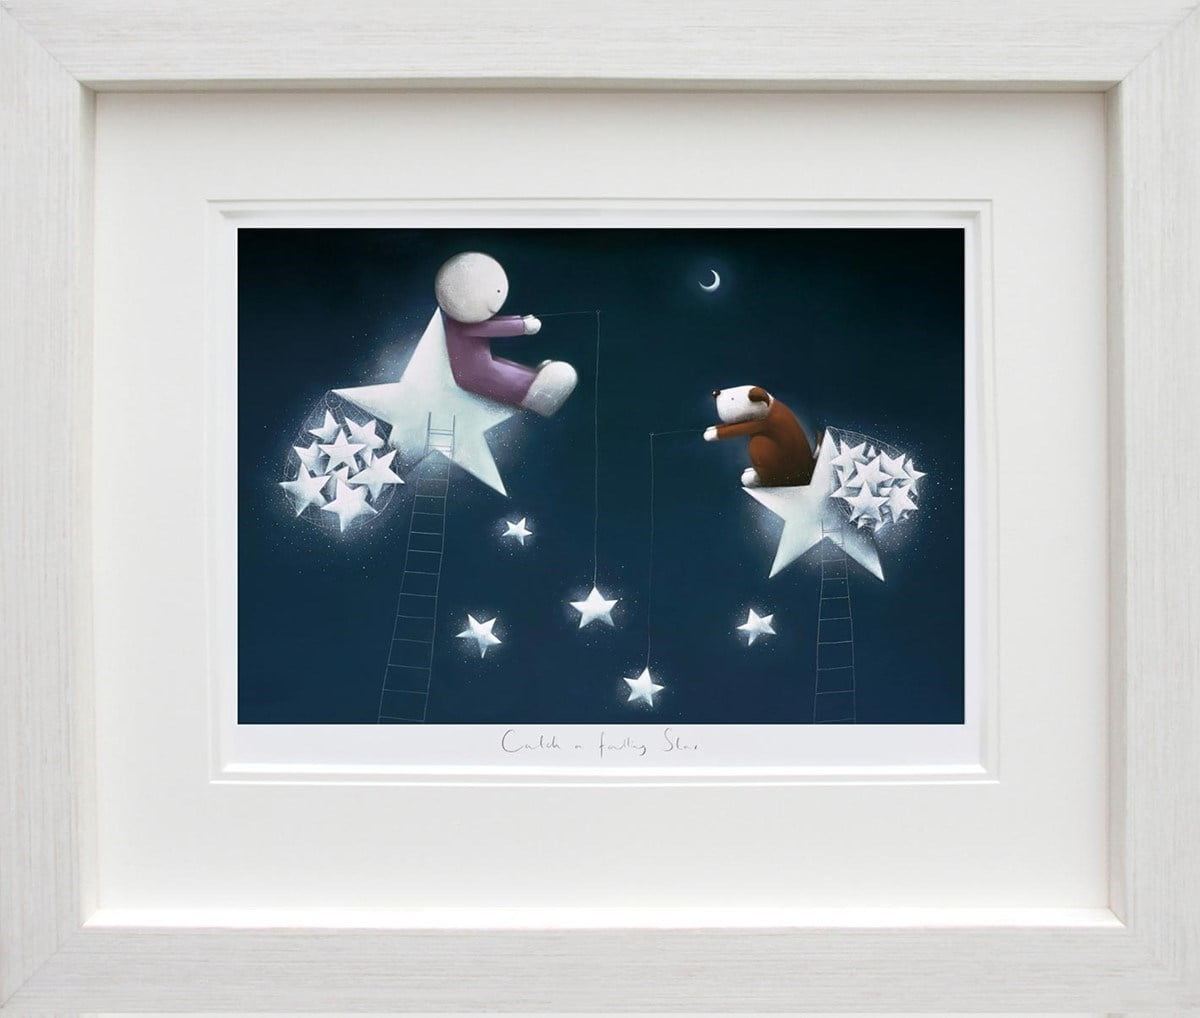 Catch a Falling Star ~ Doug Hyde